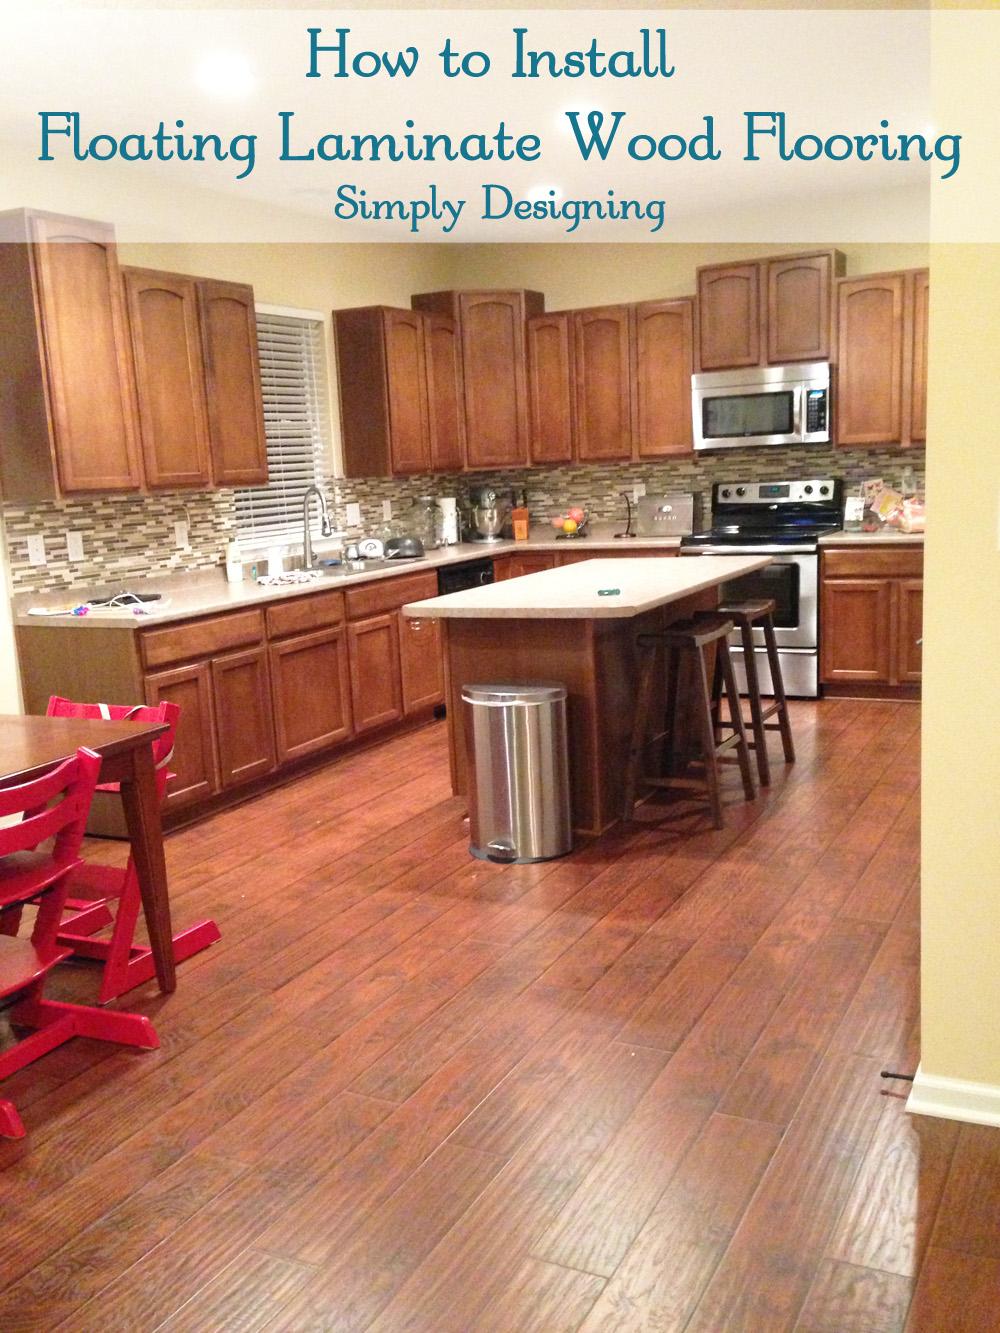 Laminate Flooring How To Install Laminate Flooring Kitchen